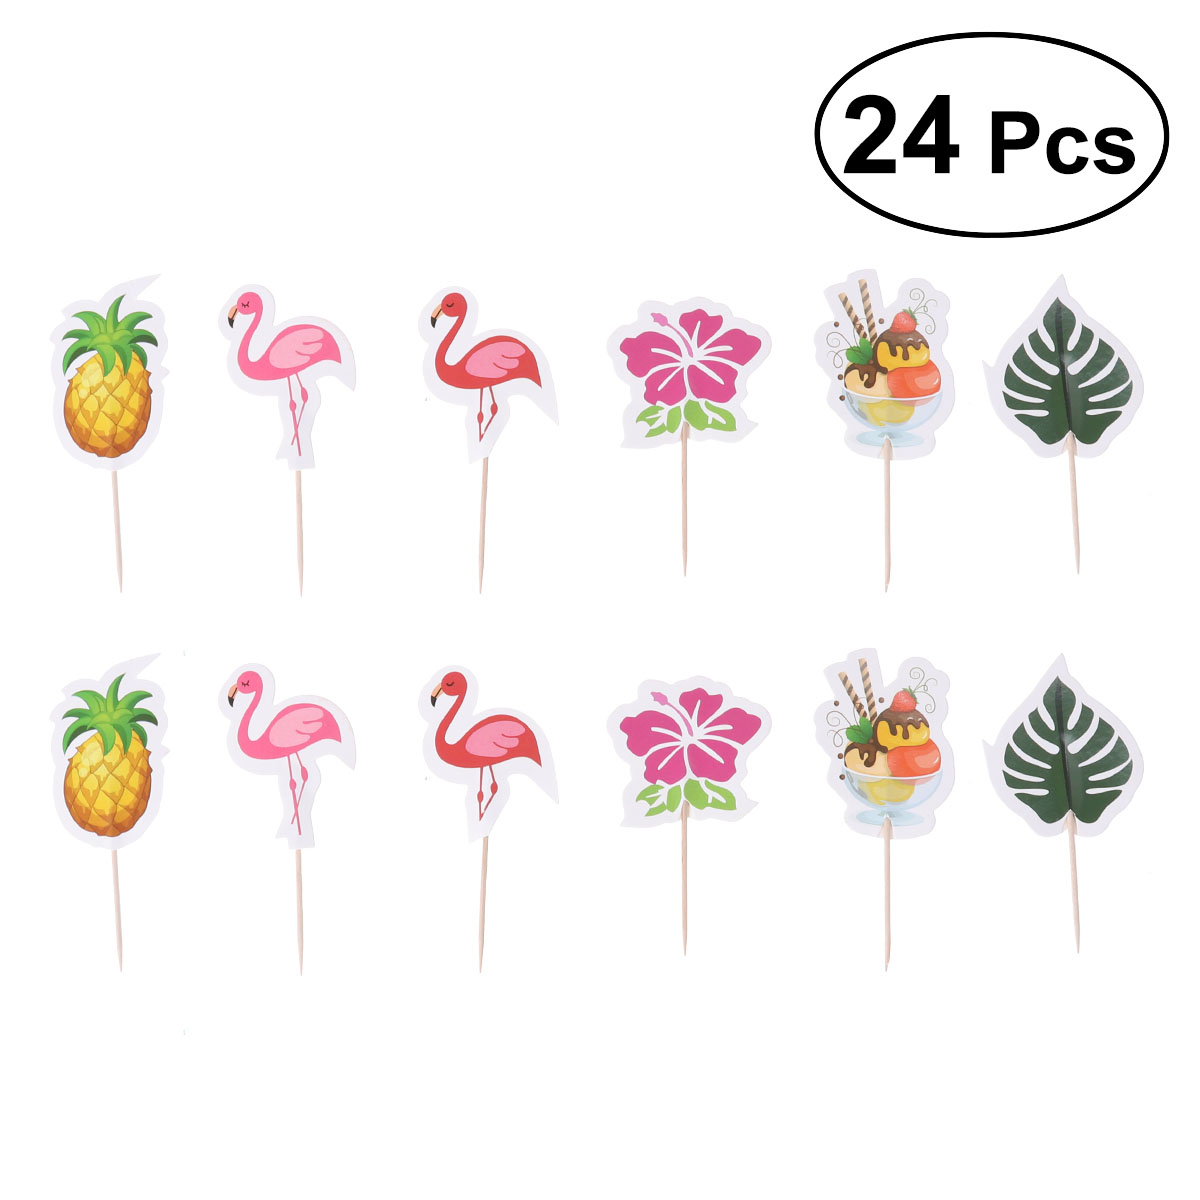 12 pcs set Pineapple Cupcake Fruit Picks Birthday Hawaii Party Cake Toppers Luau